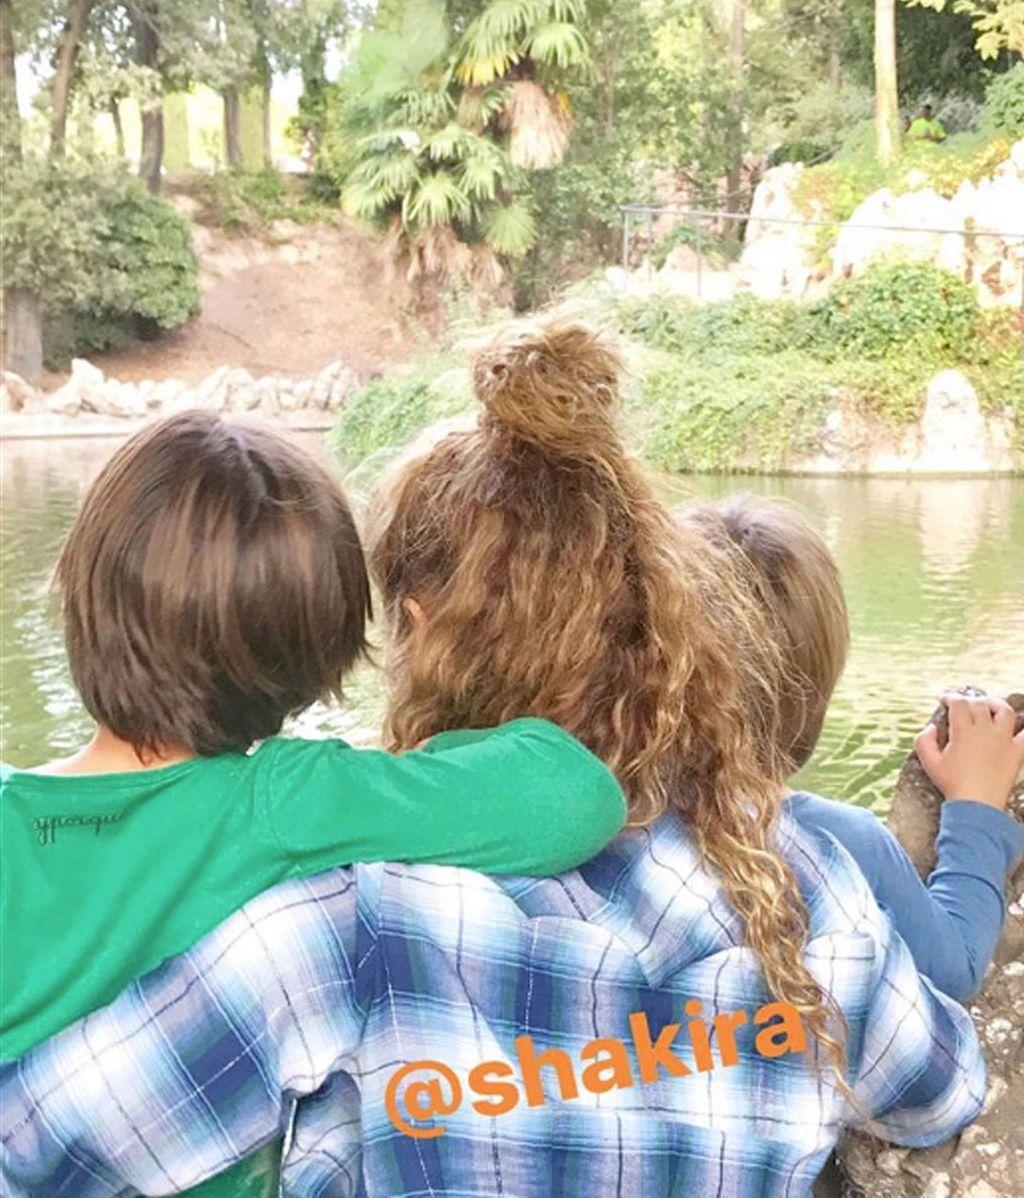 Shakira y Piqué family time